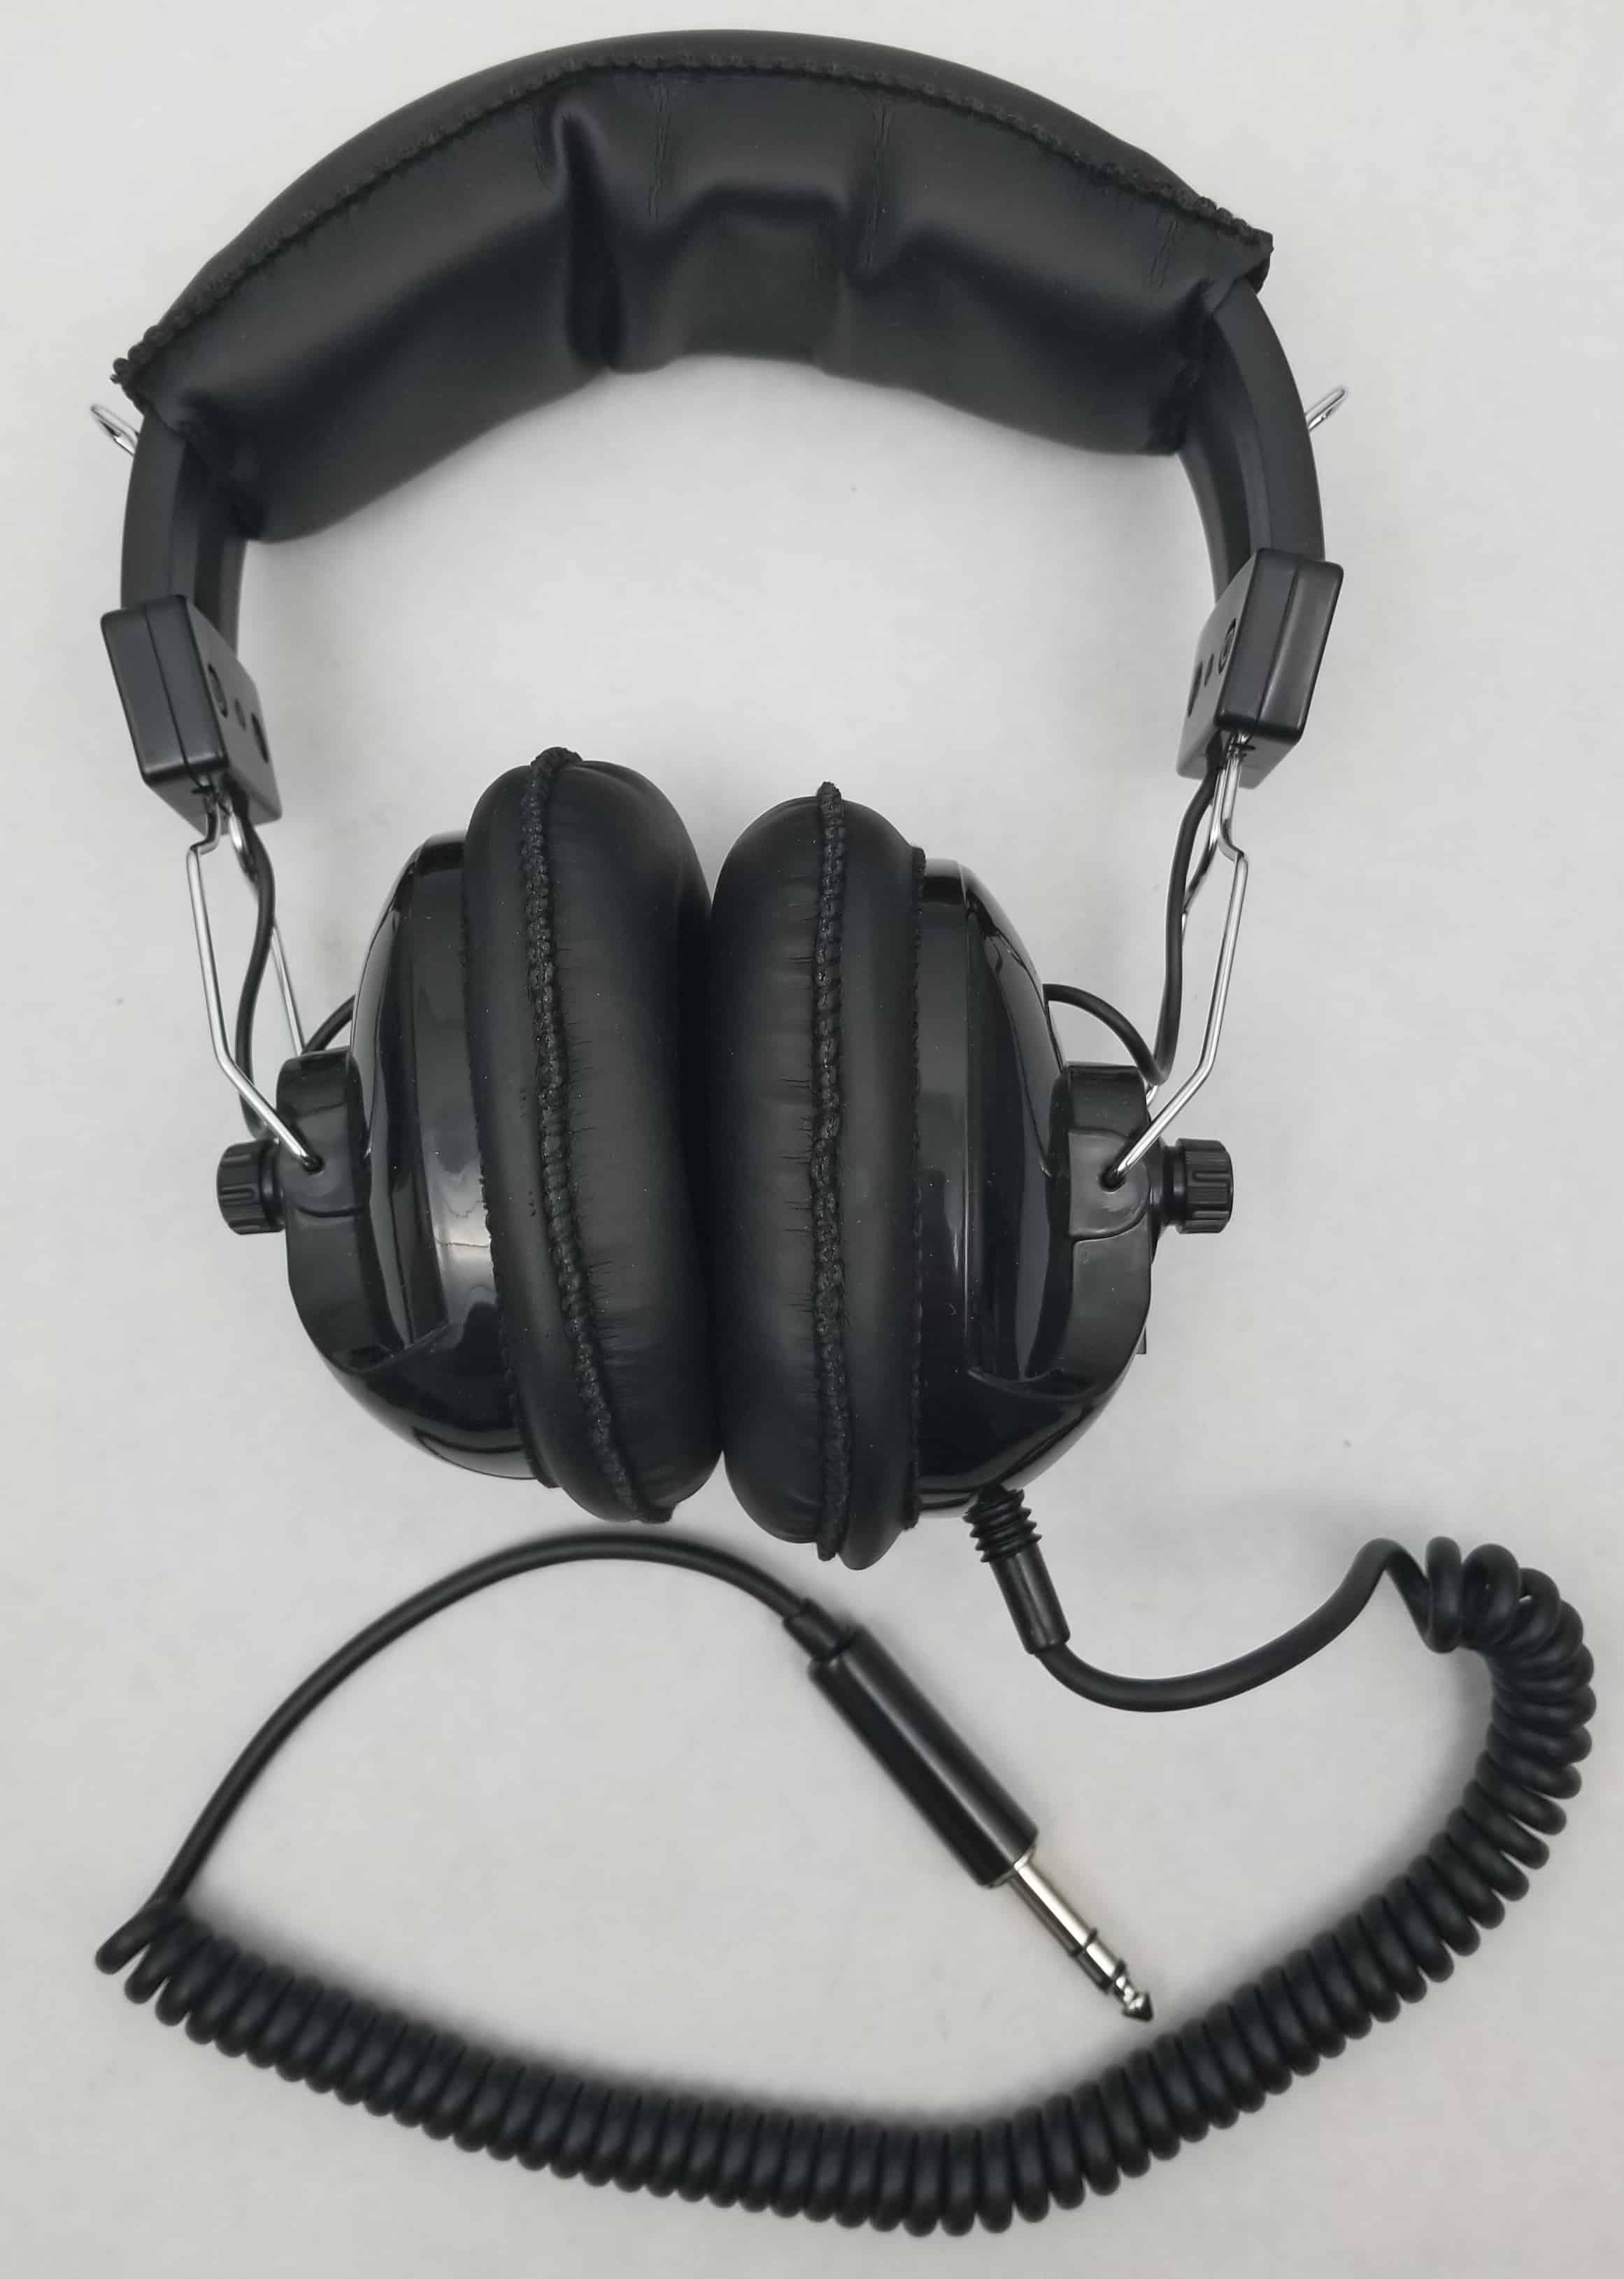 HF24 - Marmat Stereo Headphones